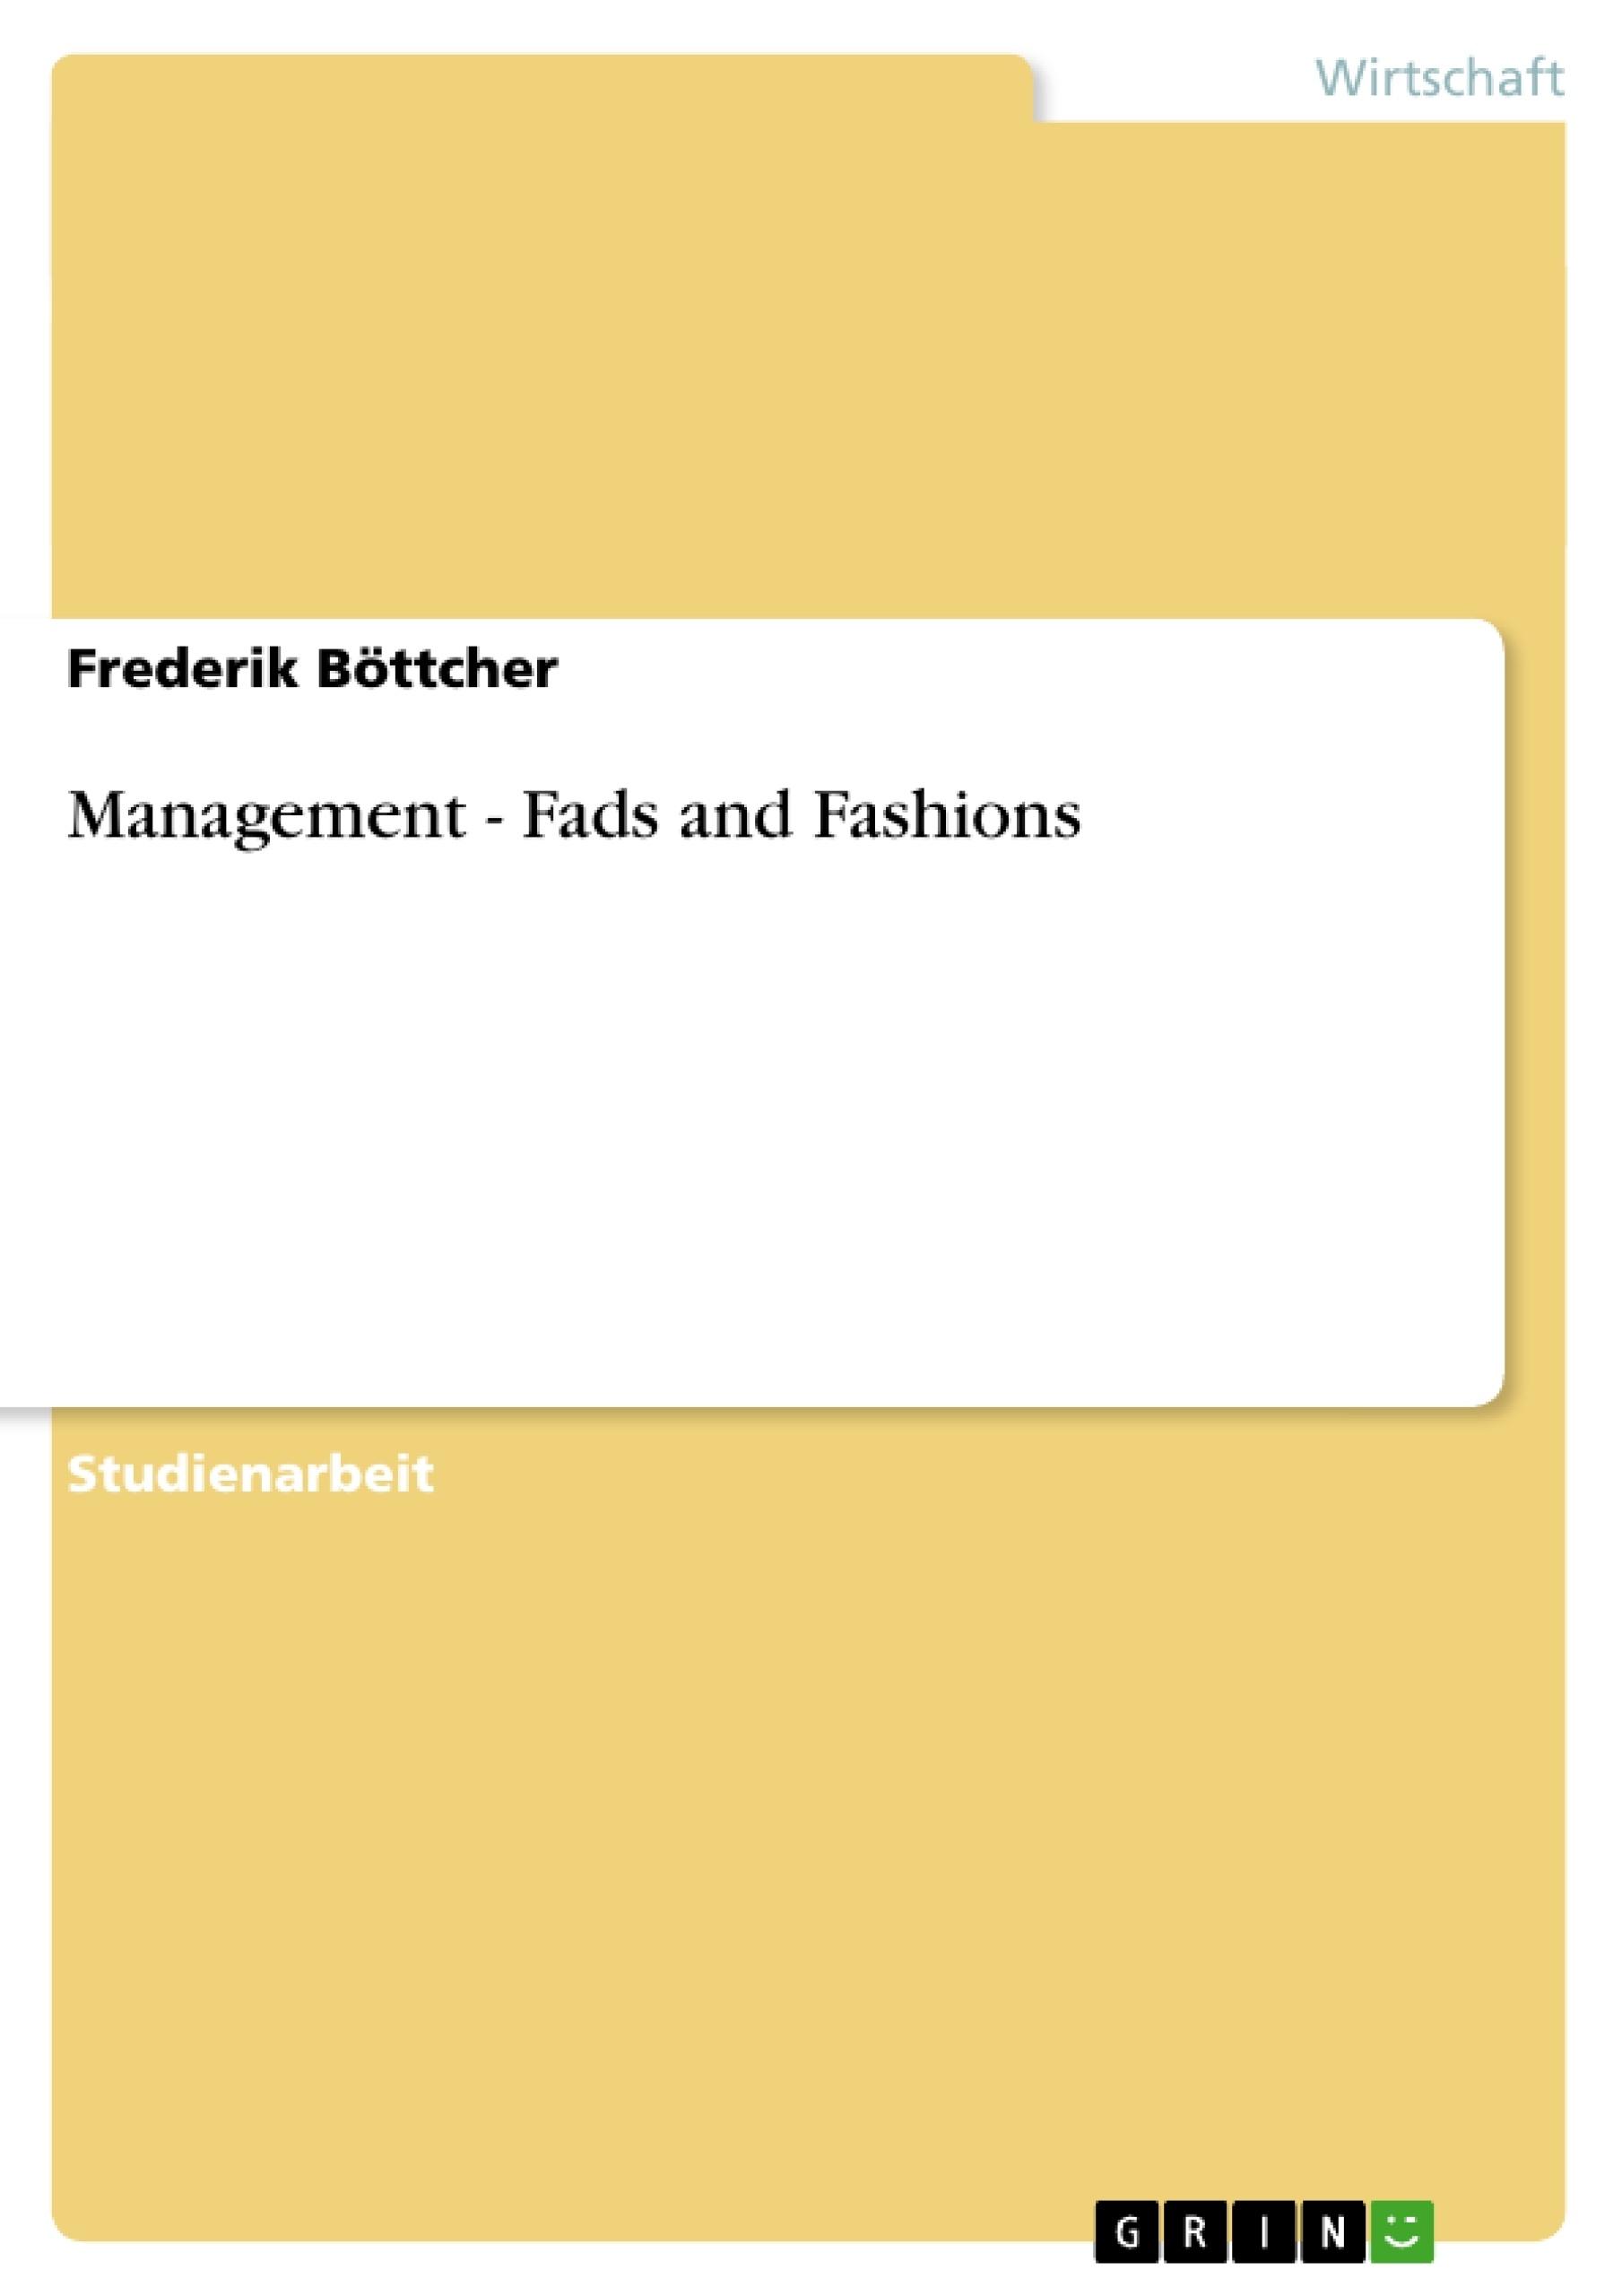 Titel: Management - Fads and Fashions